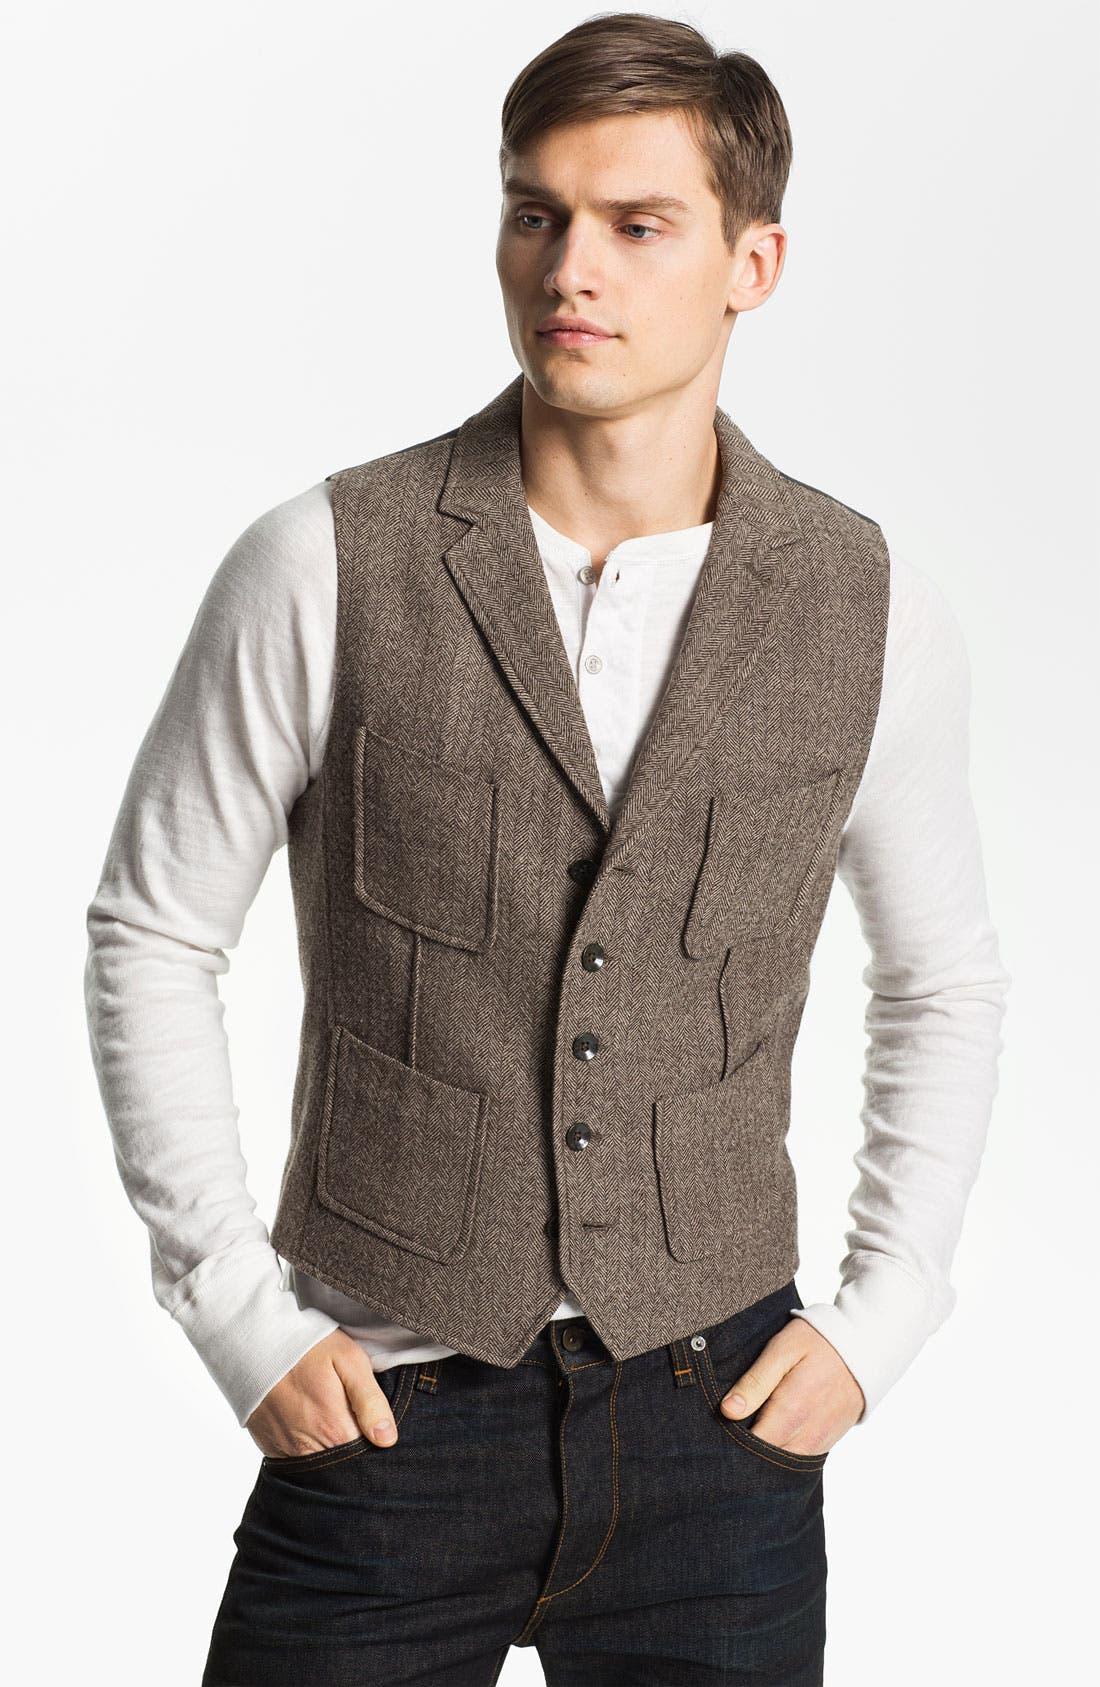 Main Image - rag & bone 'Albers' Wool Herringbone Waistcoat